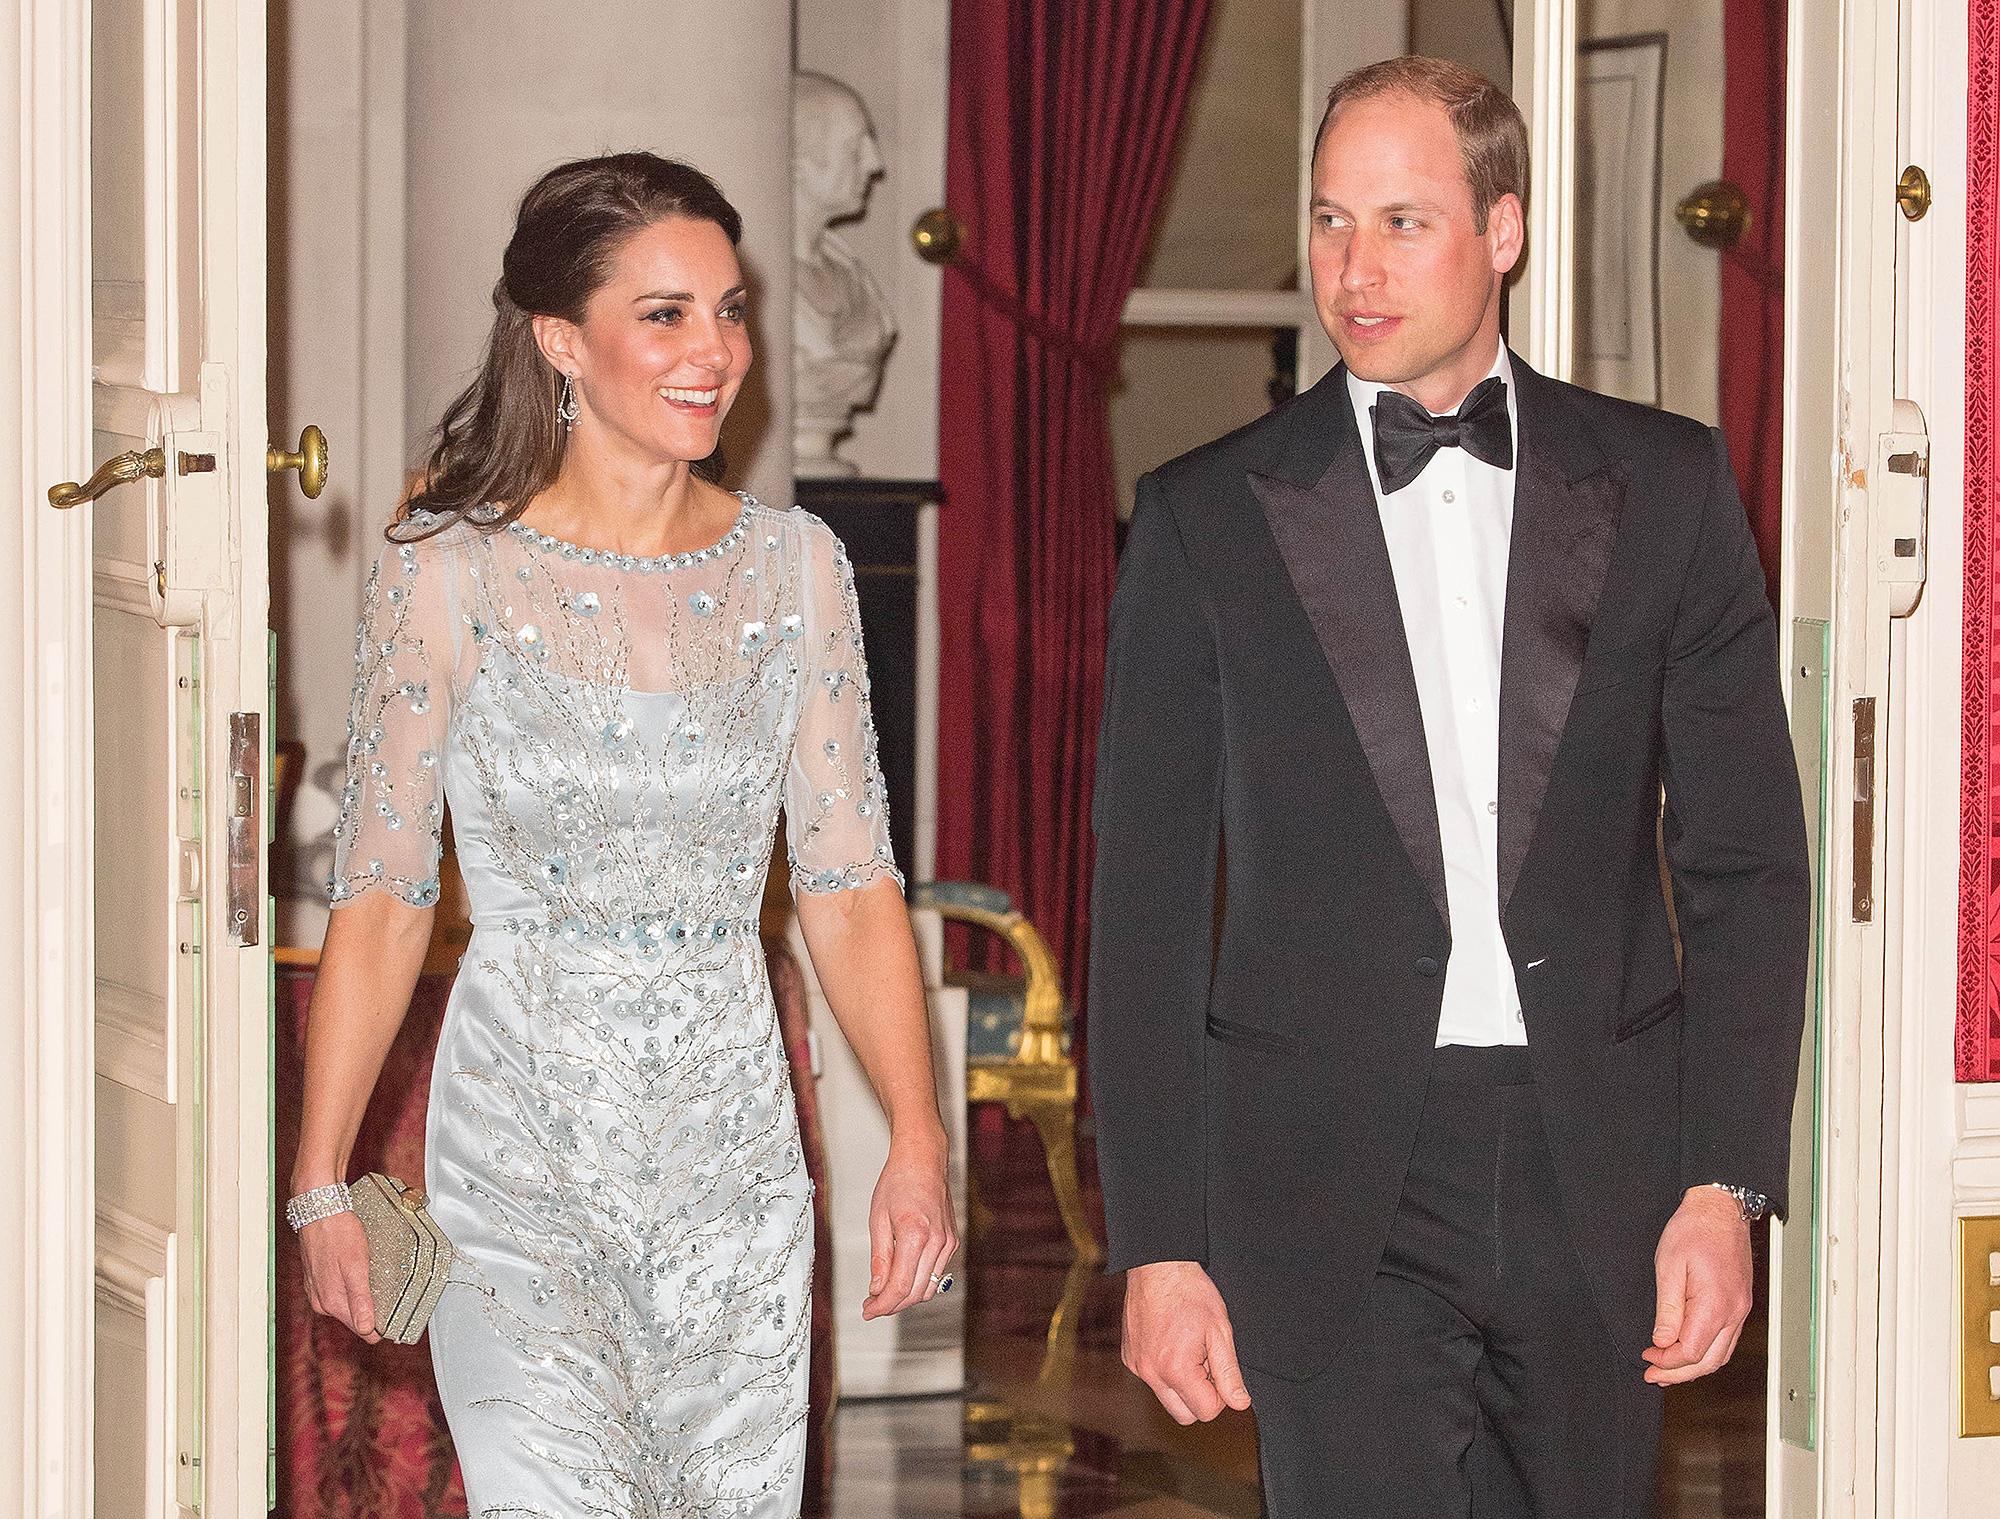 Prince William, Duke of Cambridge and Kate, Duchess of Cambridge